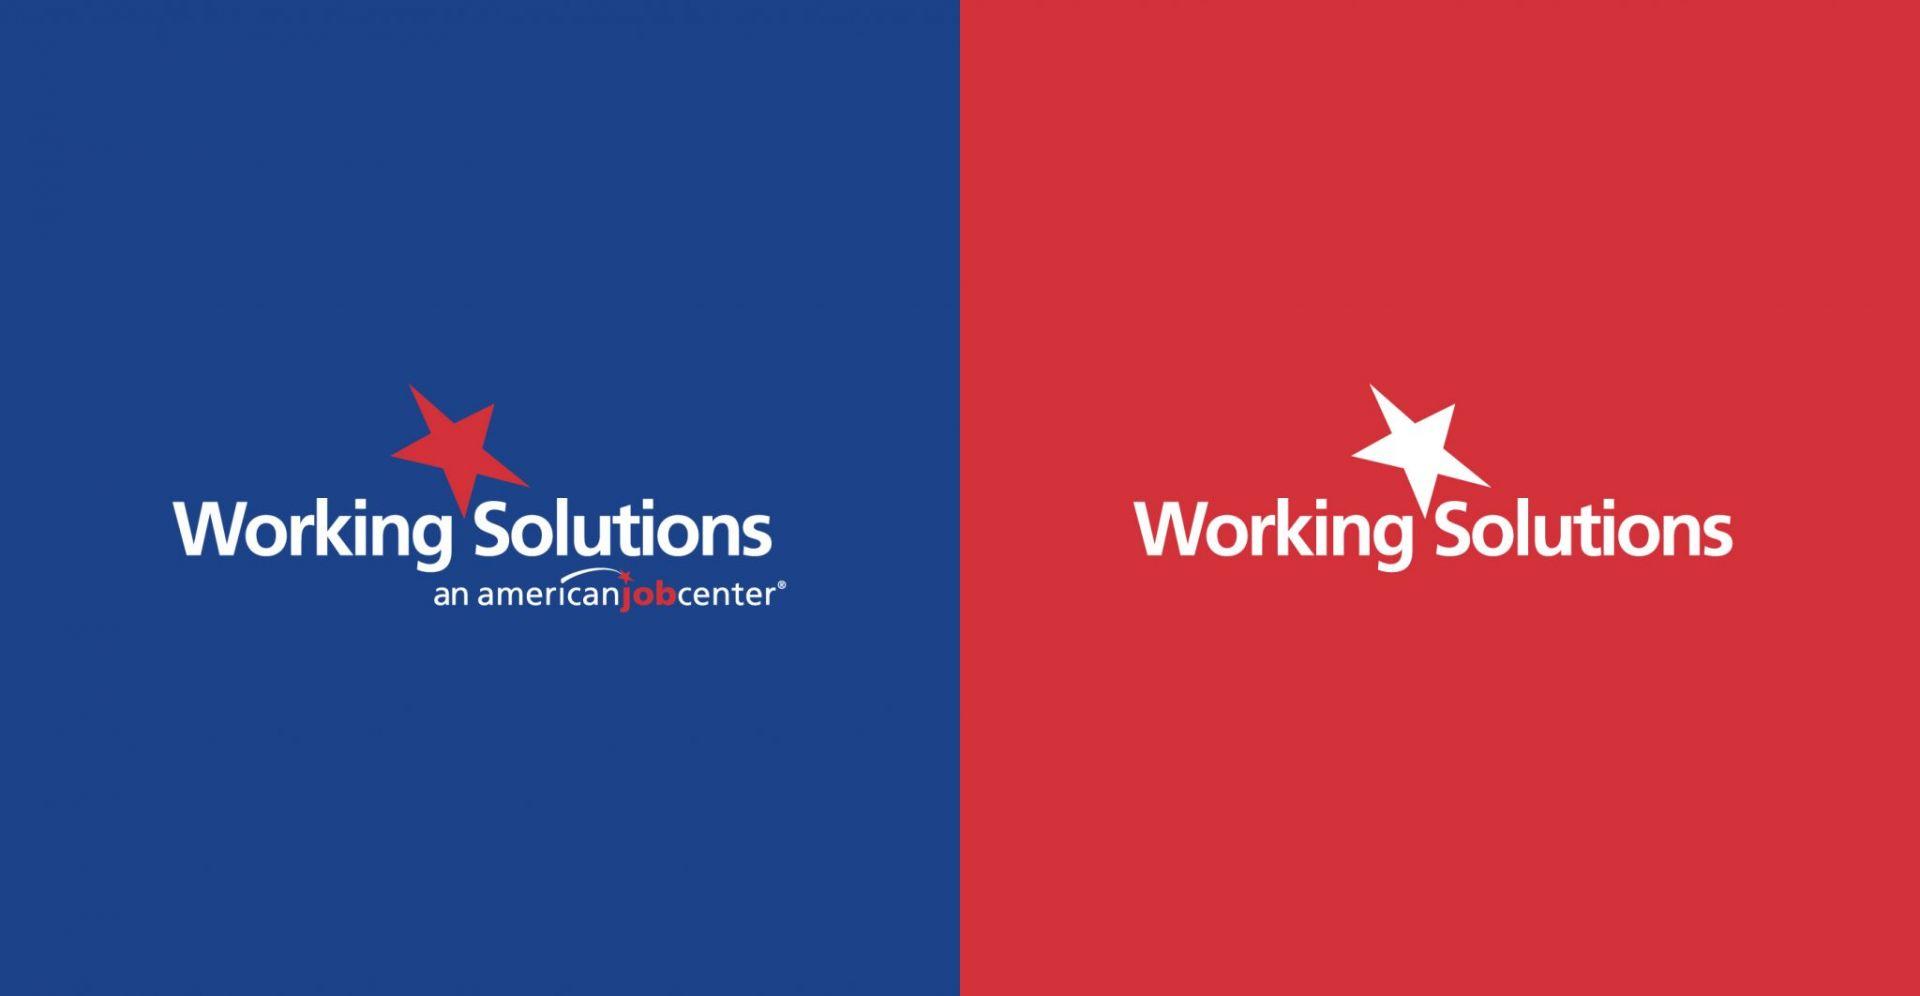 WS Alternate Logos